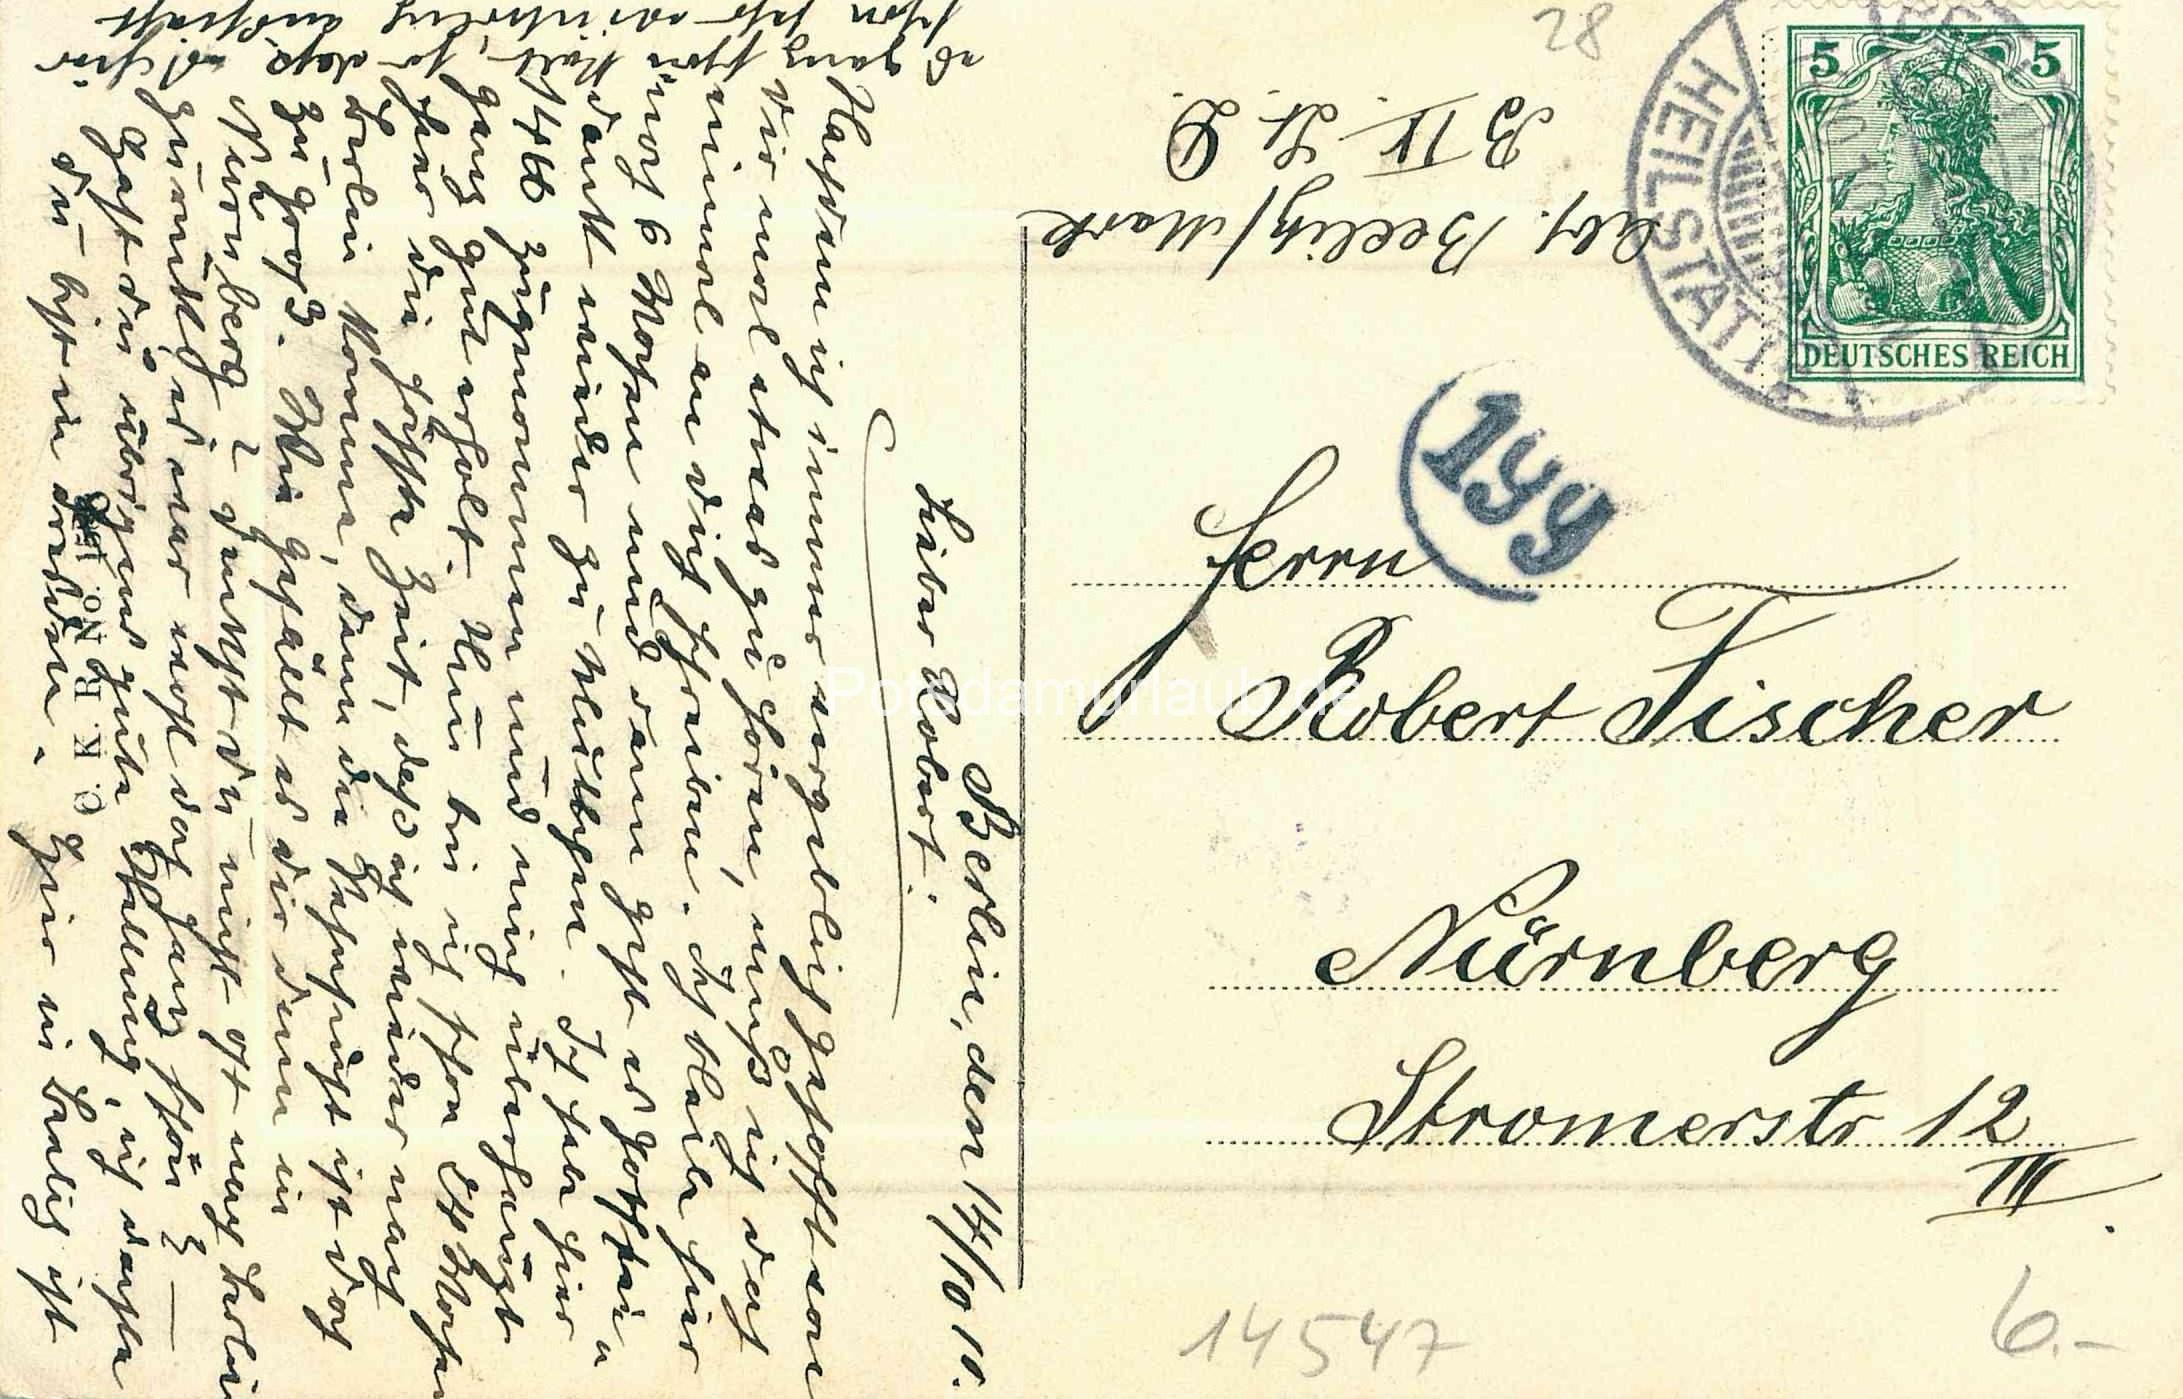 1910 10 14 r